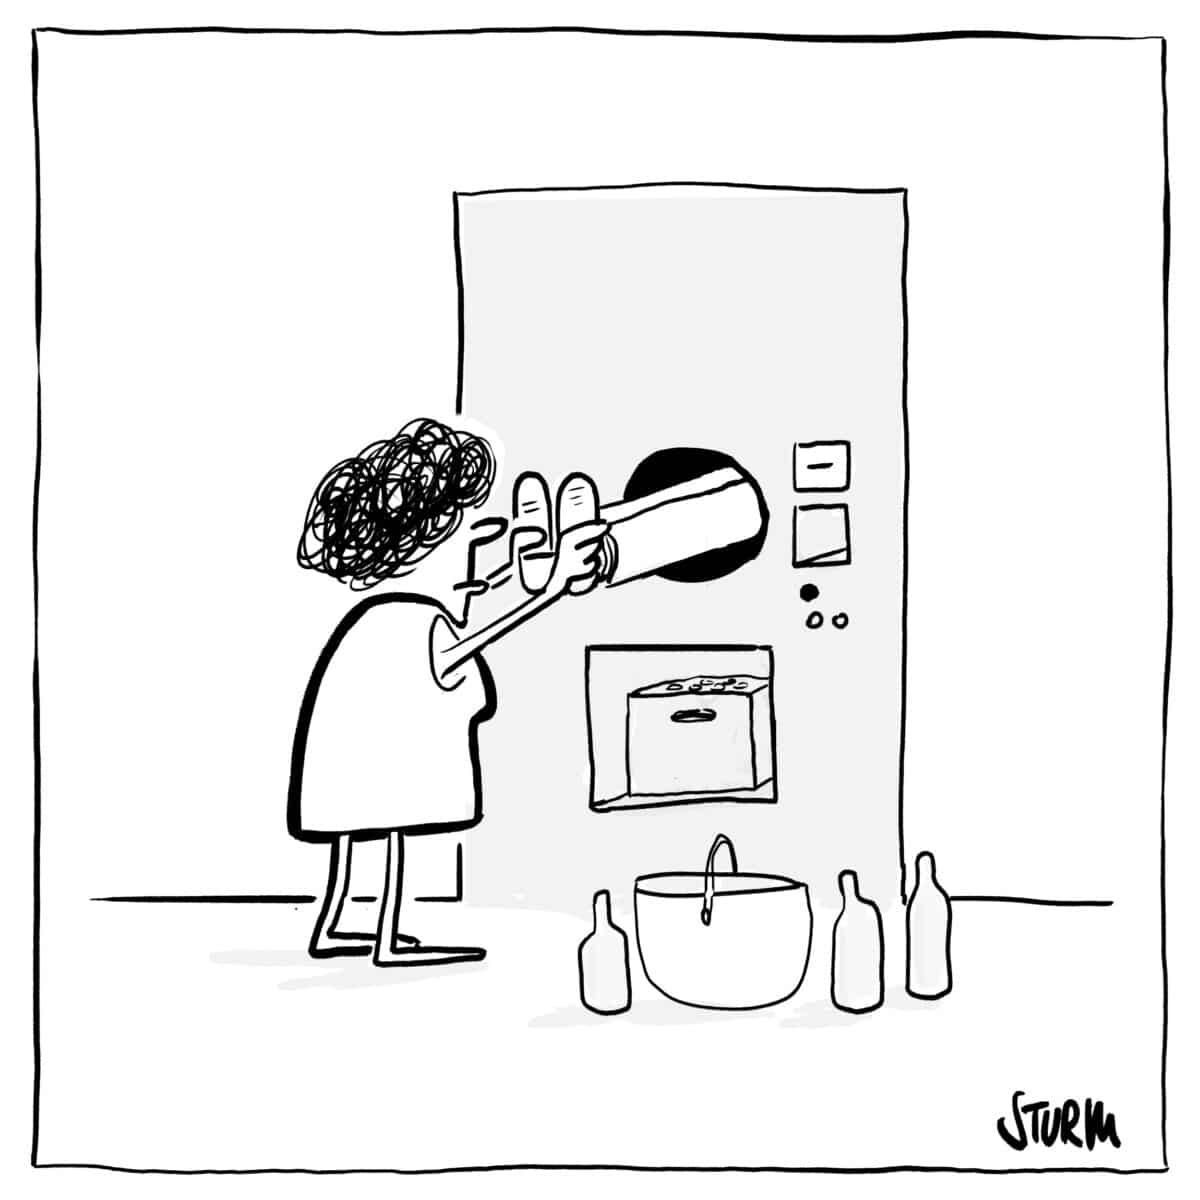 Bottle-recycling-machine_Cartoon_Philipp-Sturm